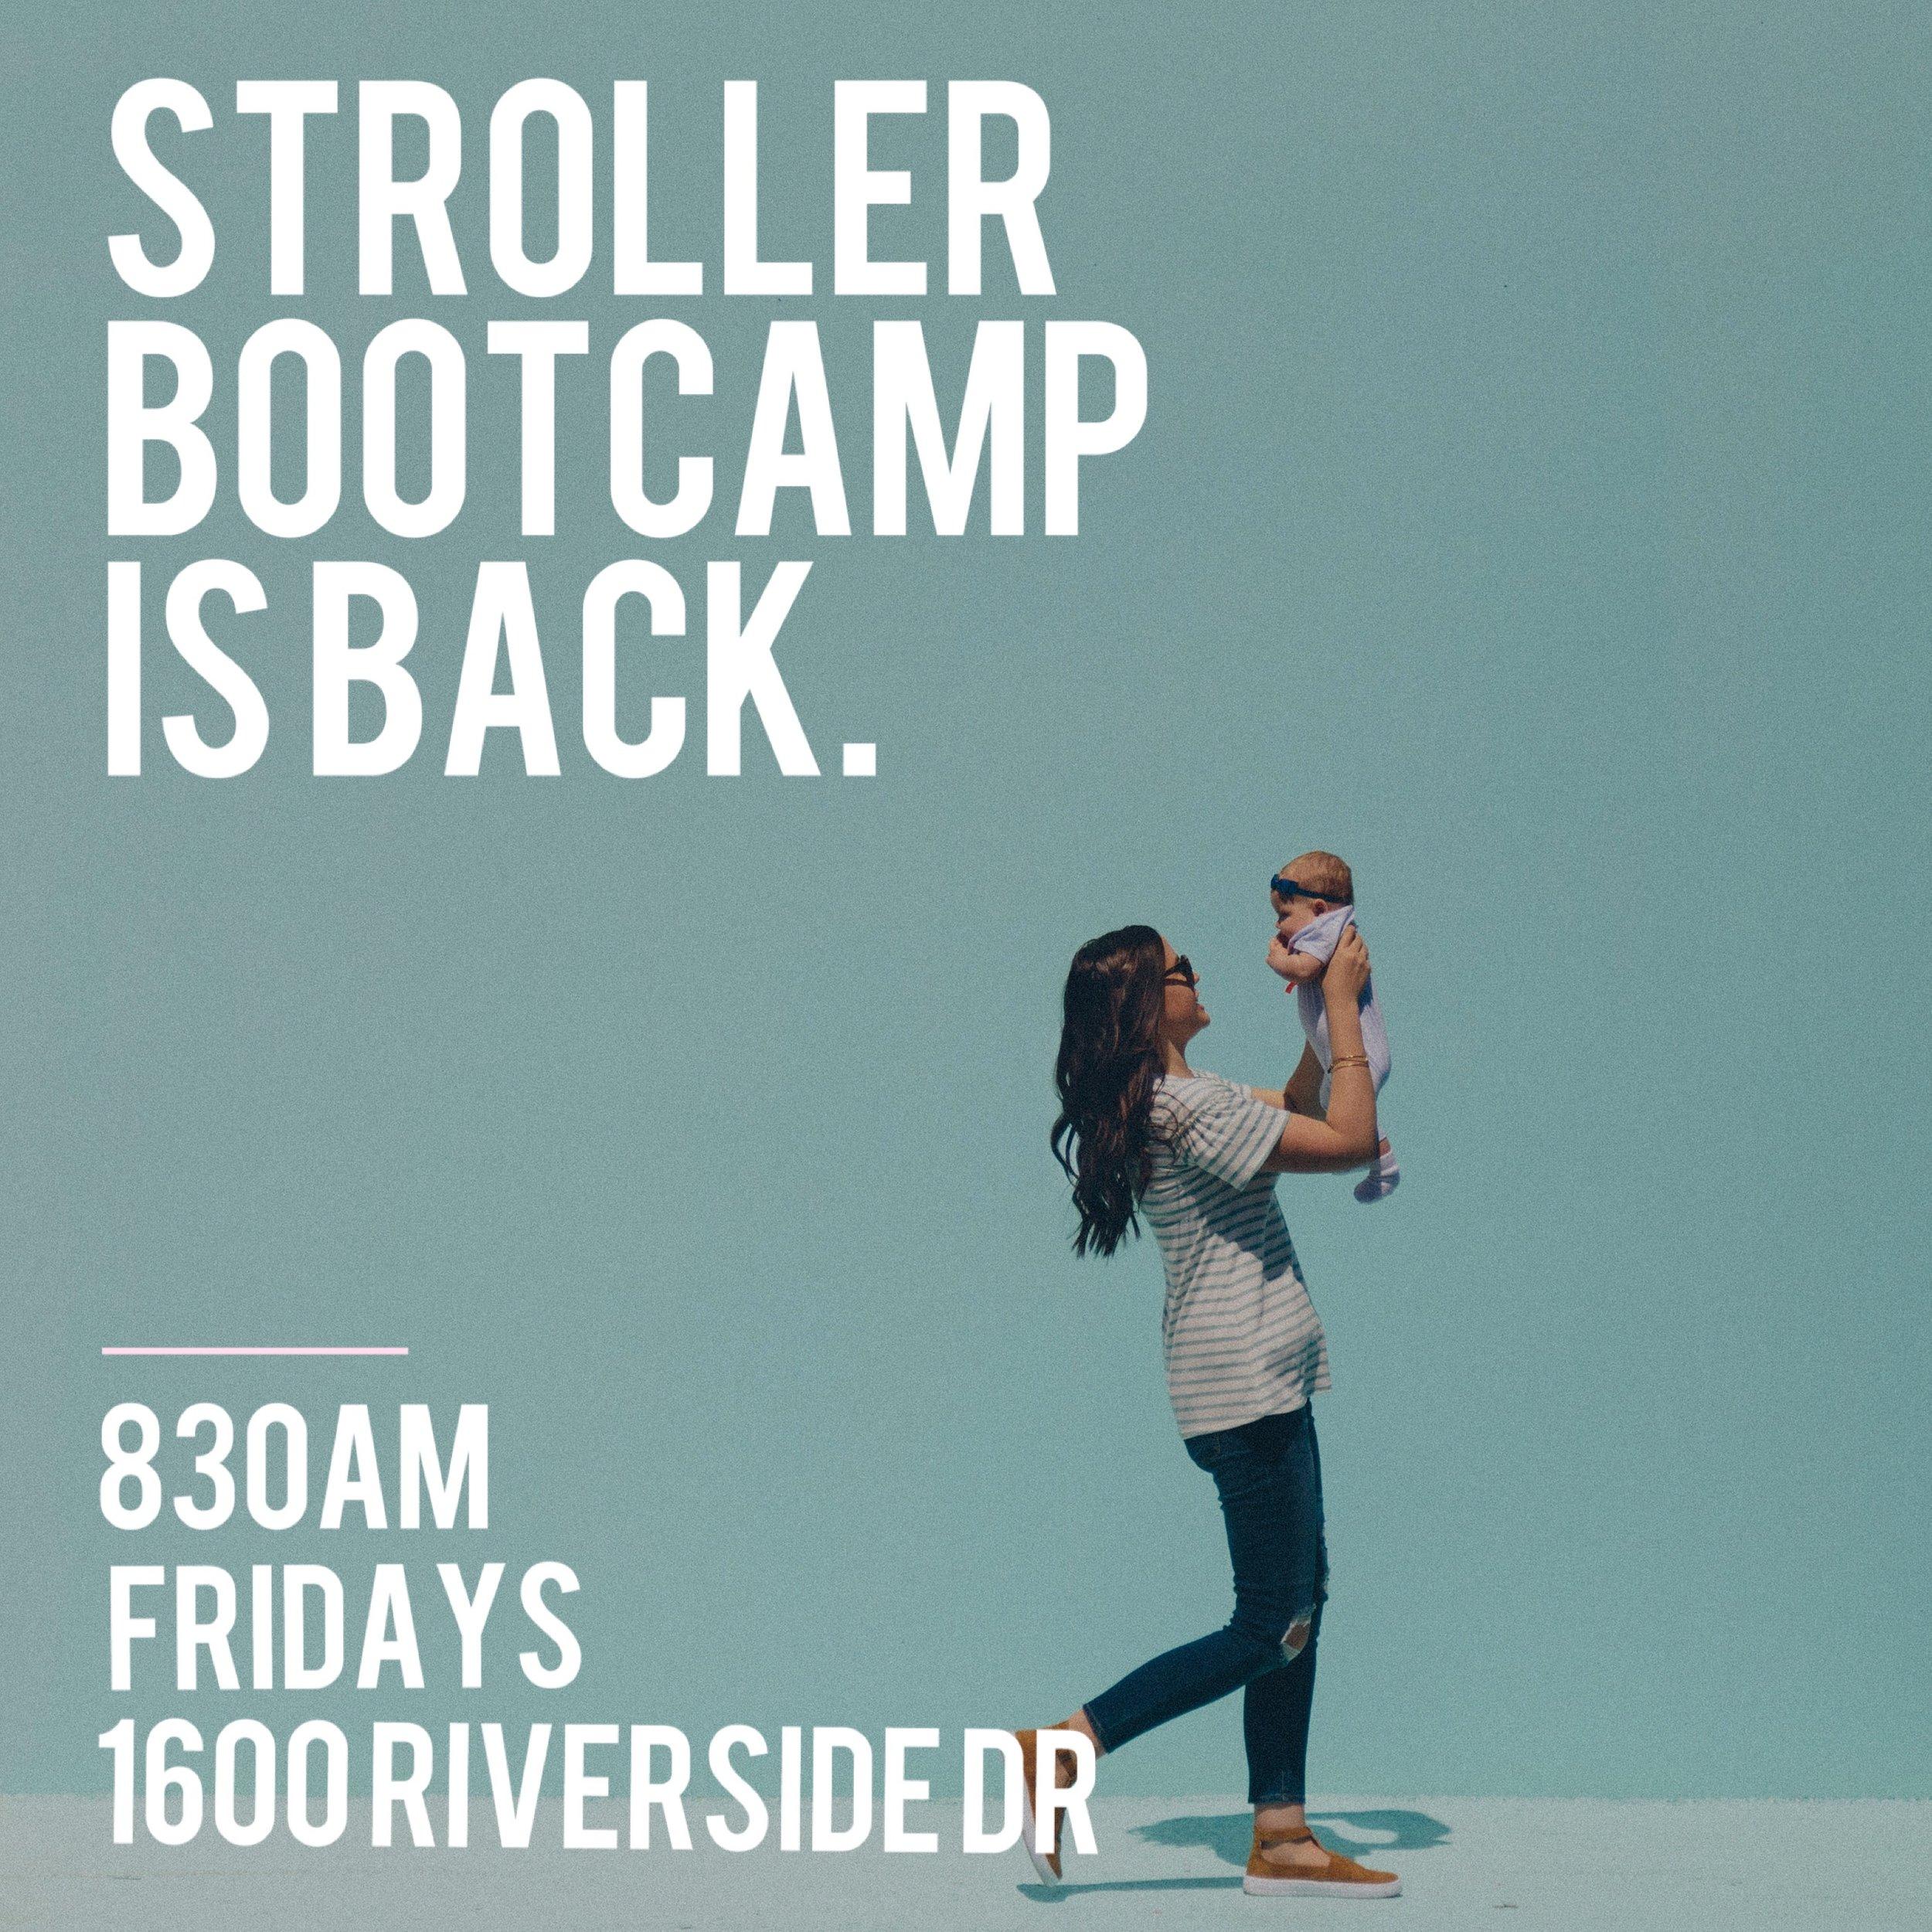 new bootcamp time.jpg